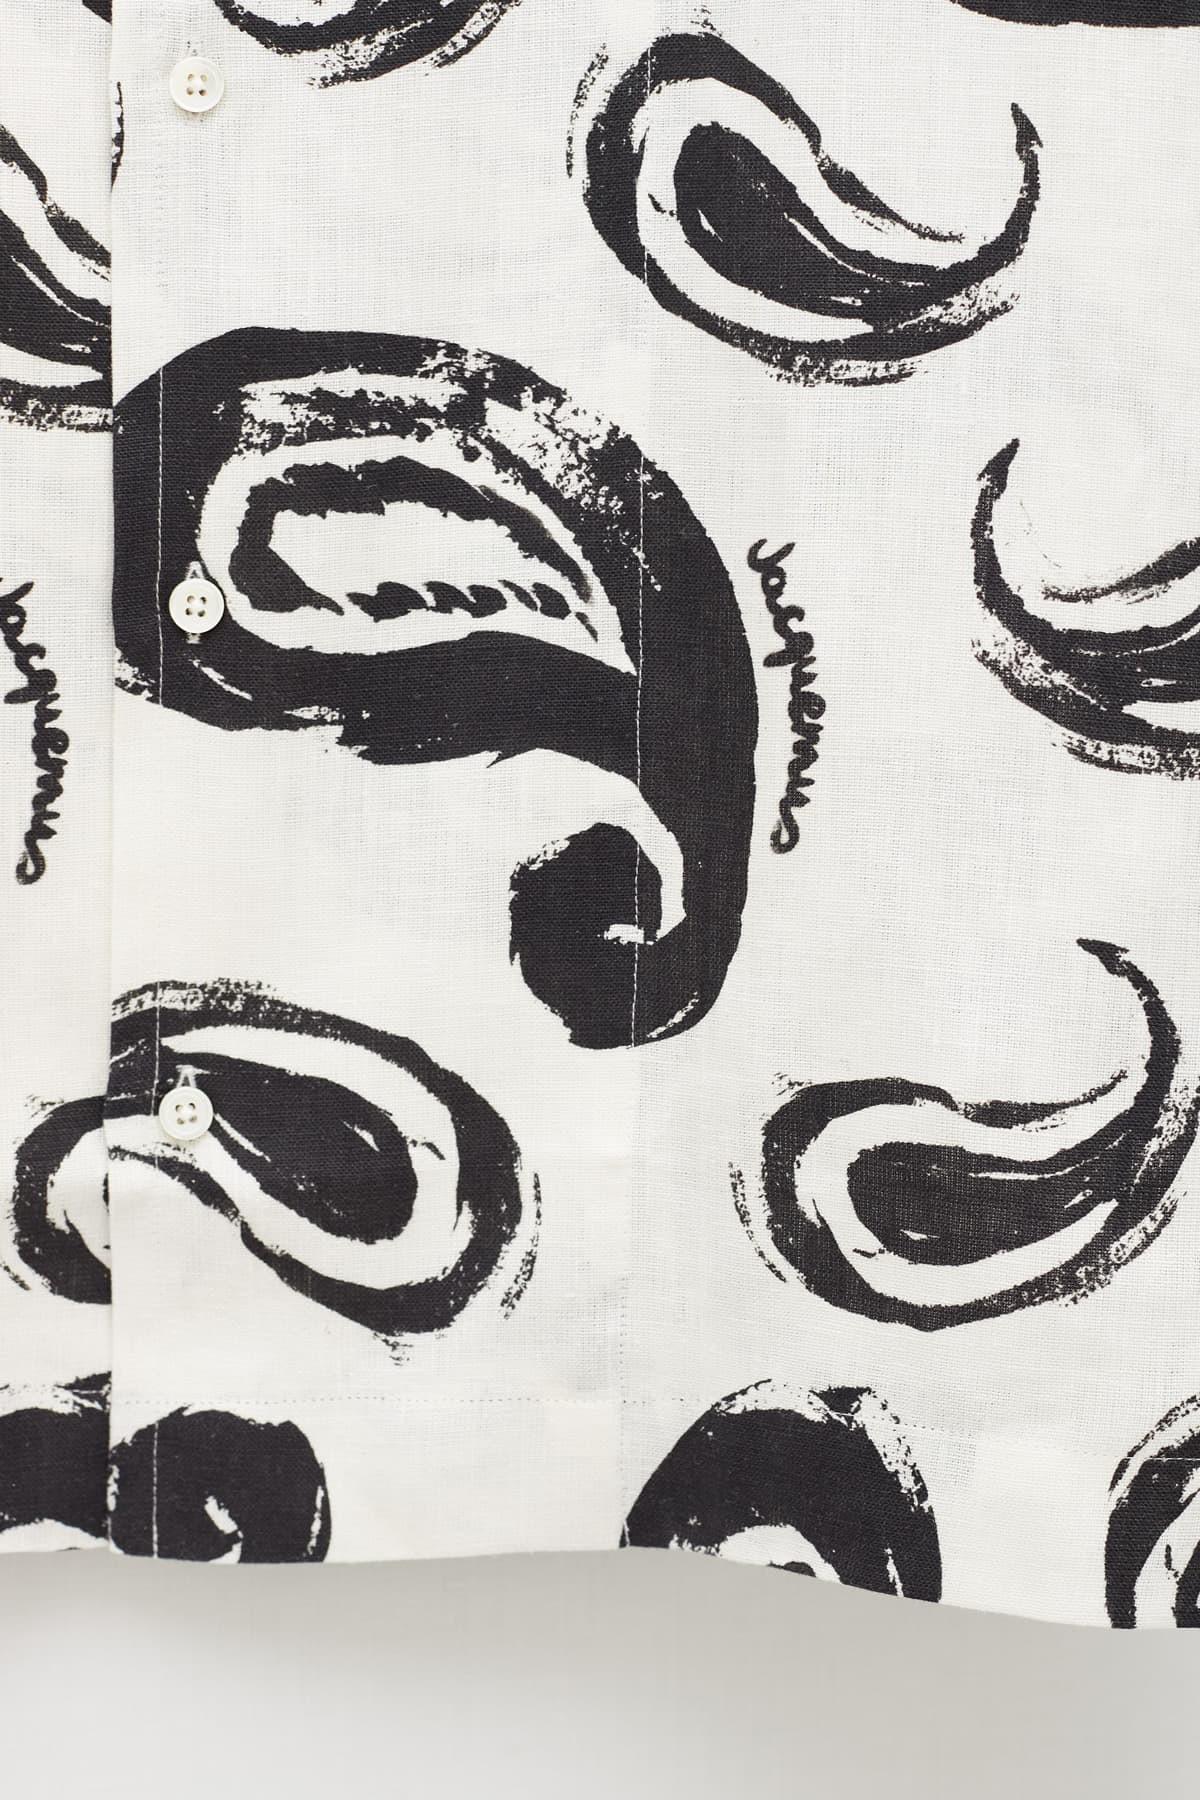 Shop Converse Natural Low Chuck 70 Sneakers 162211C